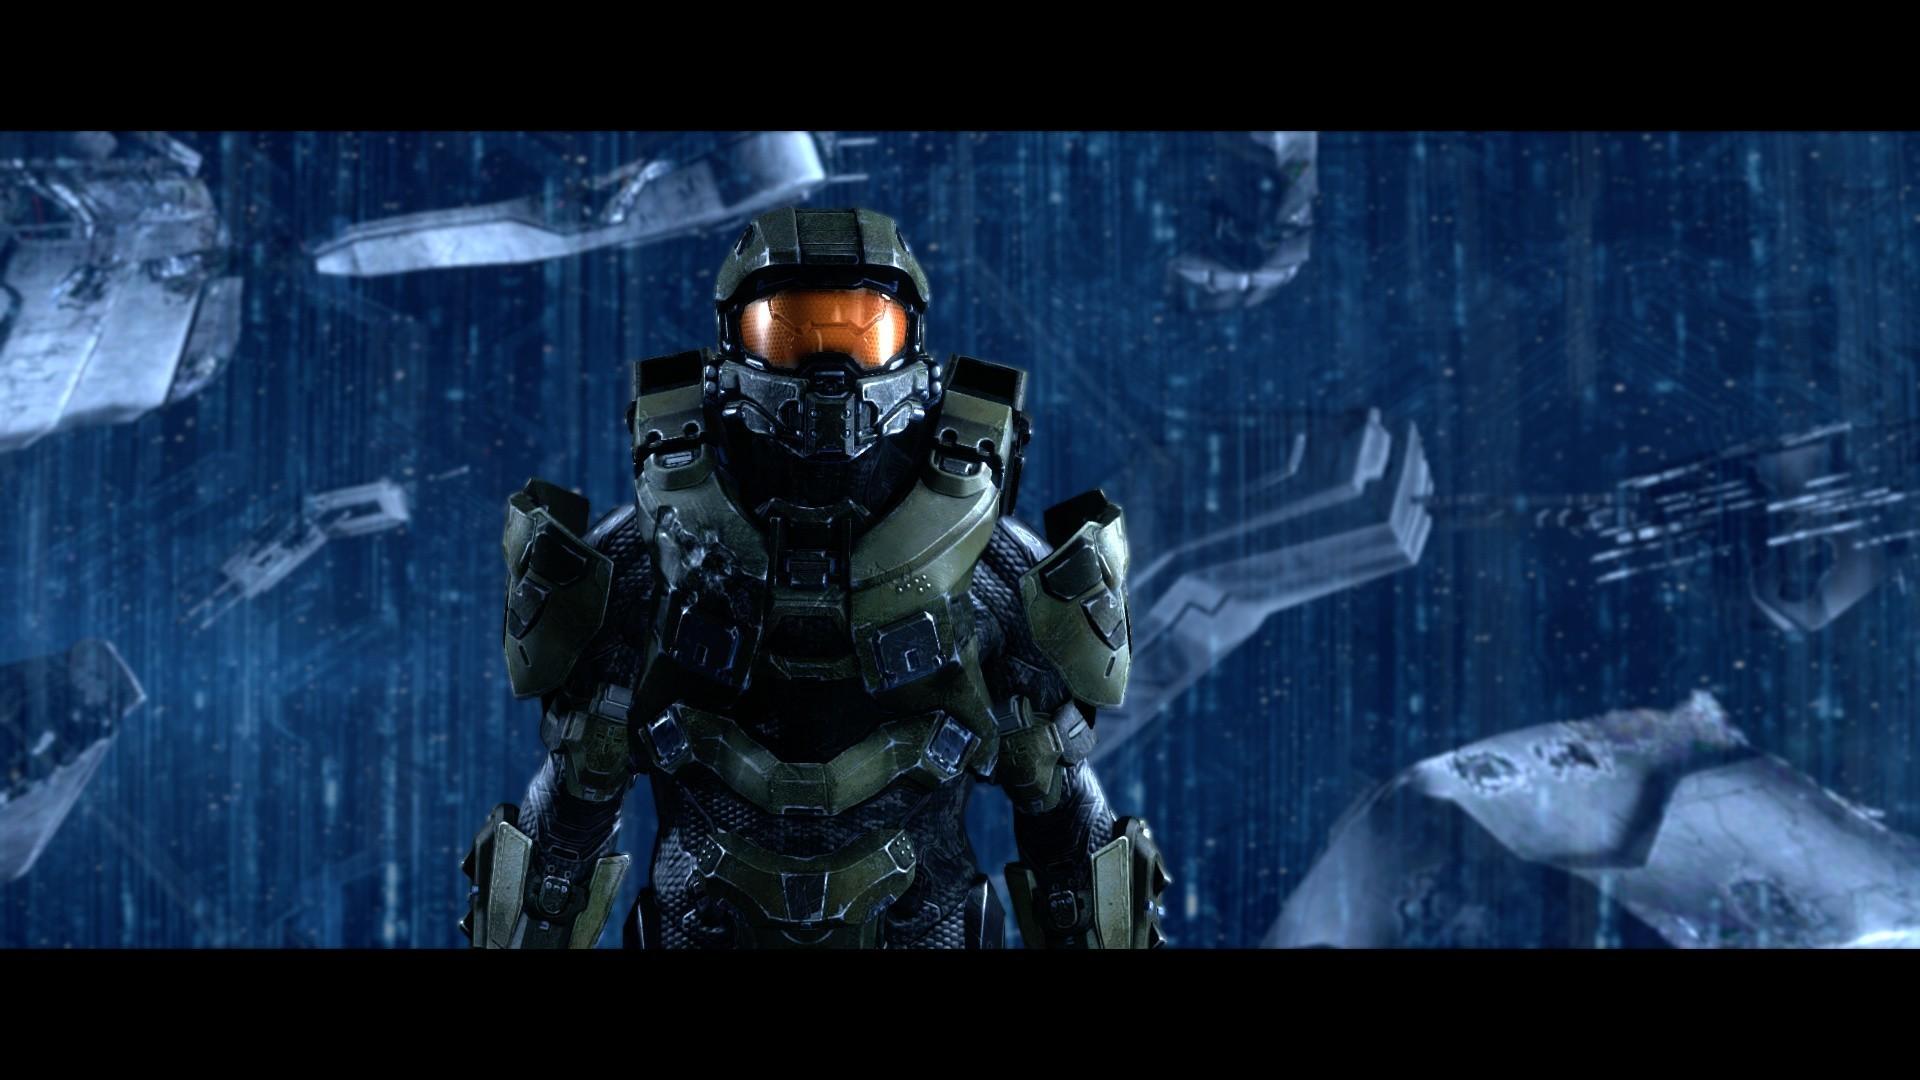 Halo 4 cortana wallpaper 72 images - Halo 4 photos ...